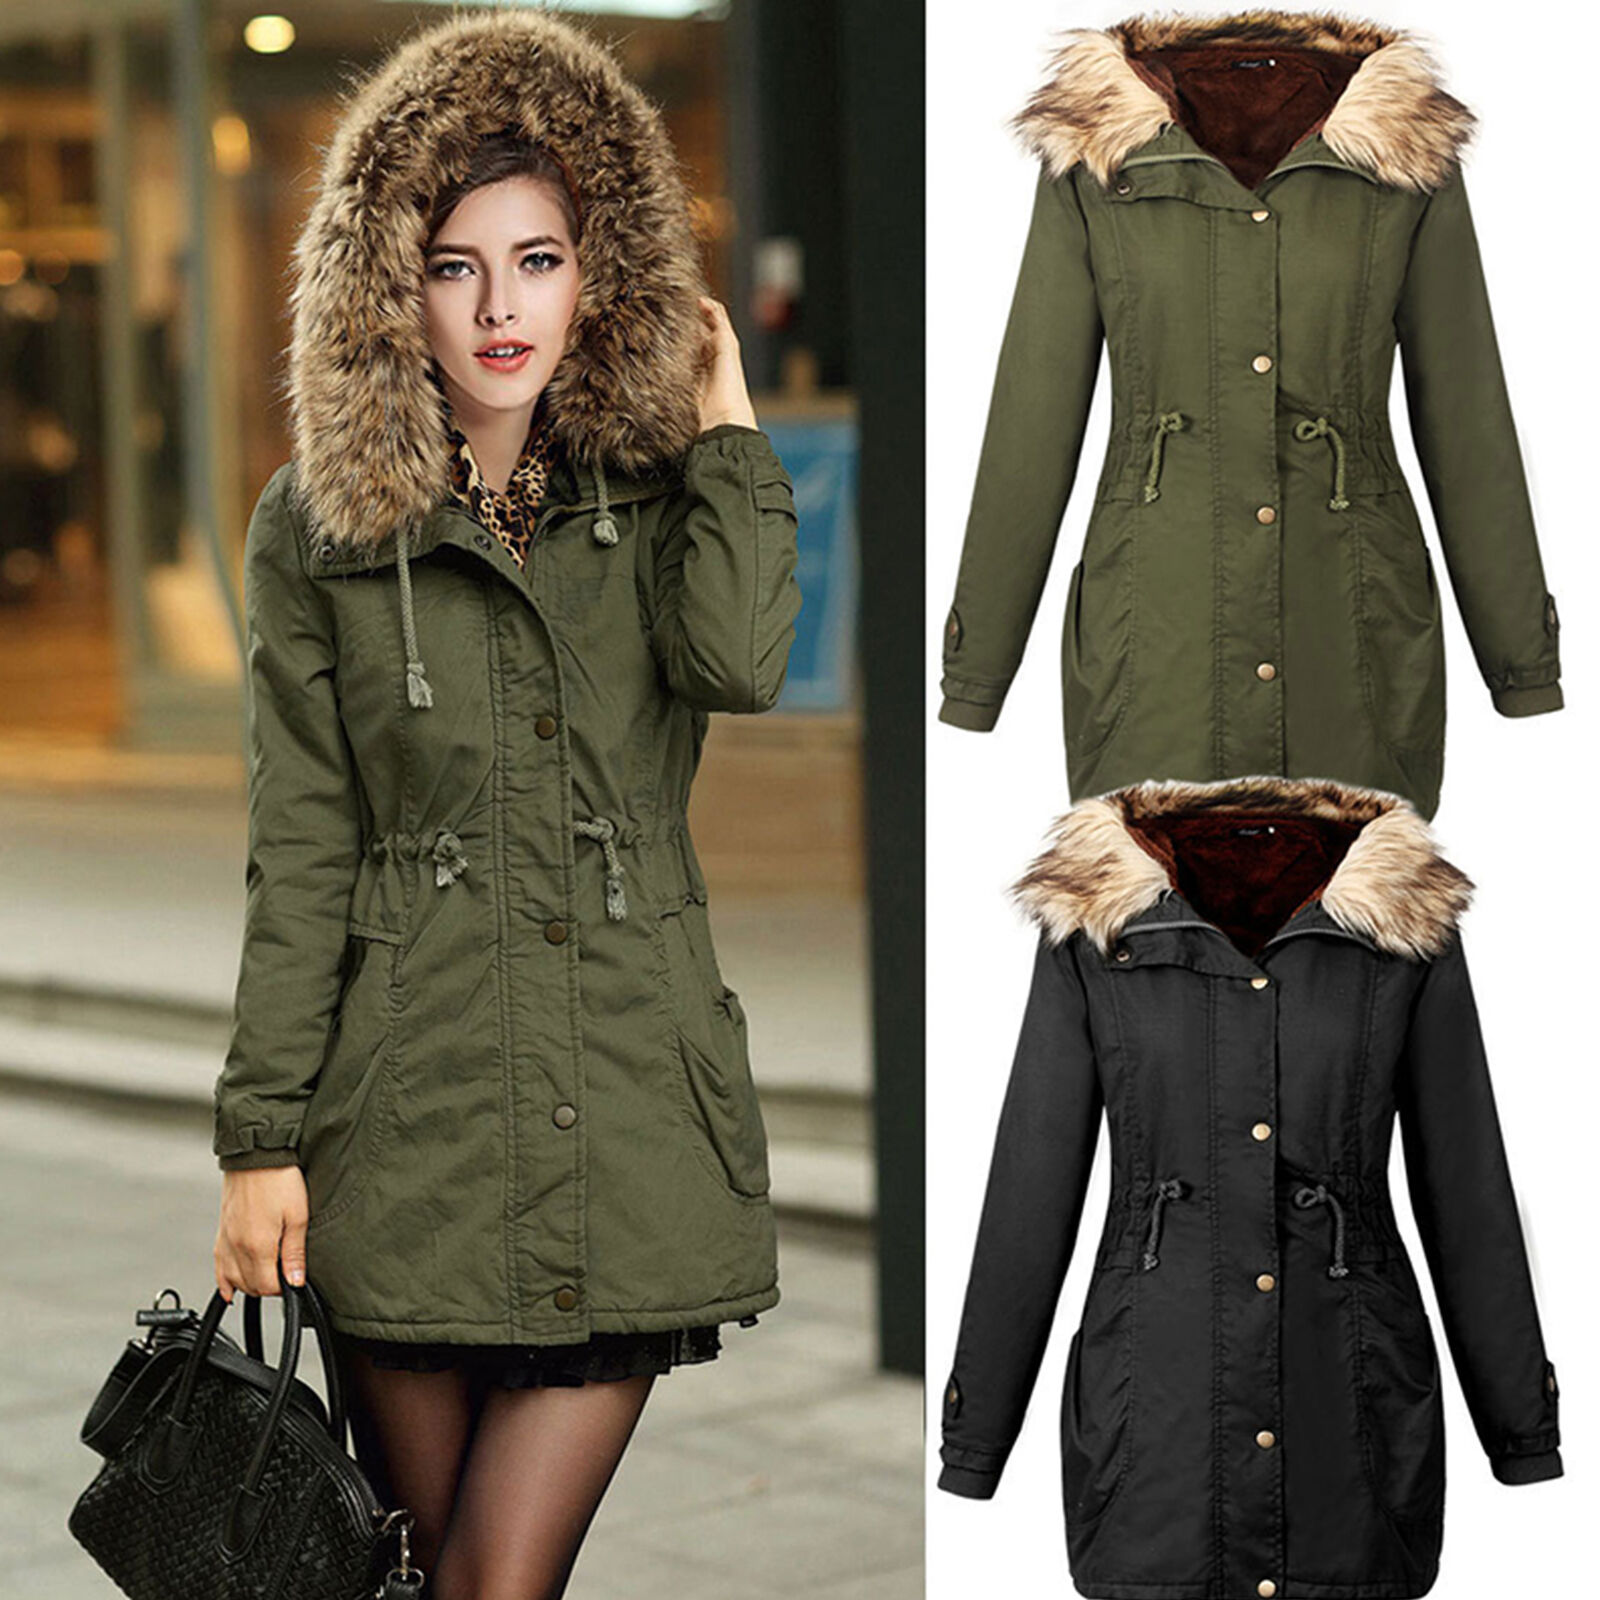 Womens Thicken Fur Collar Hooded Outwear Jacket Winter Warm